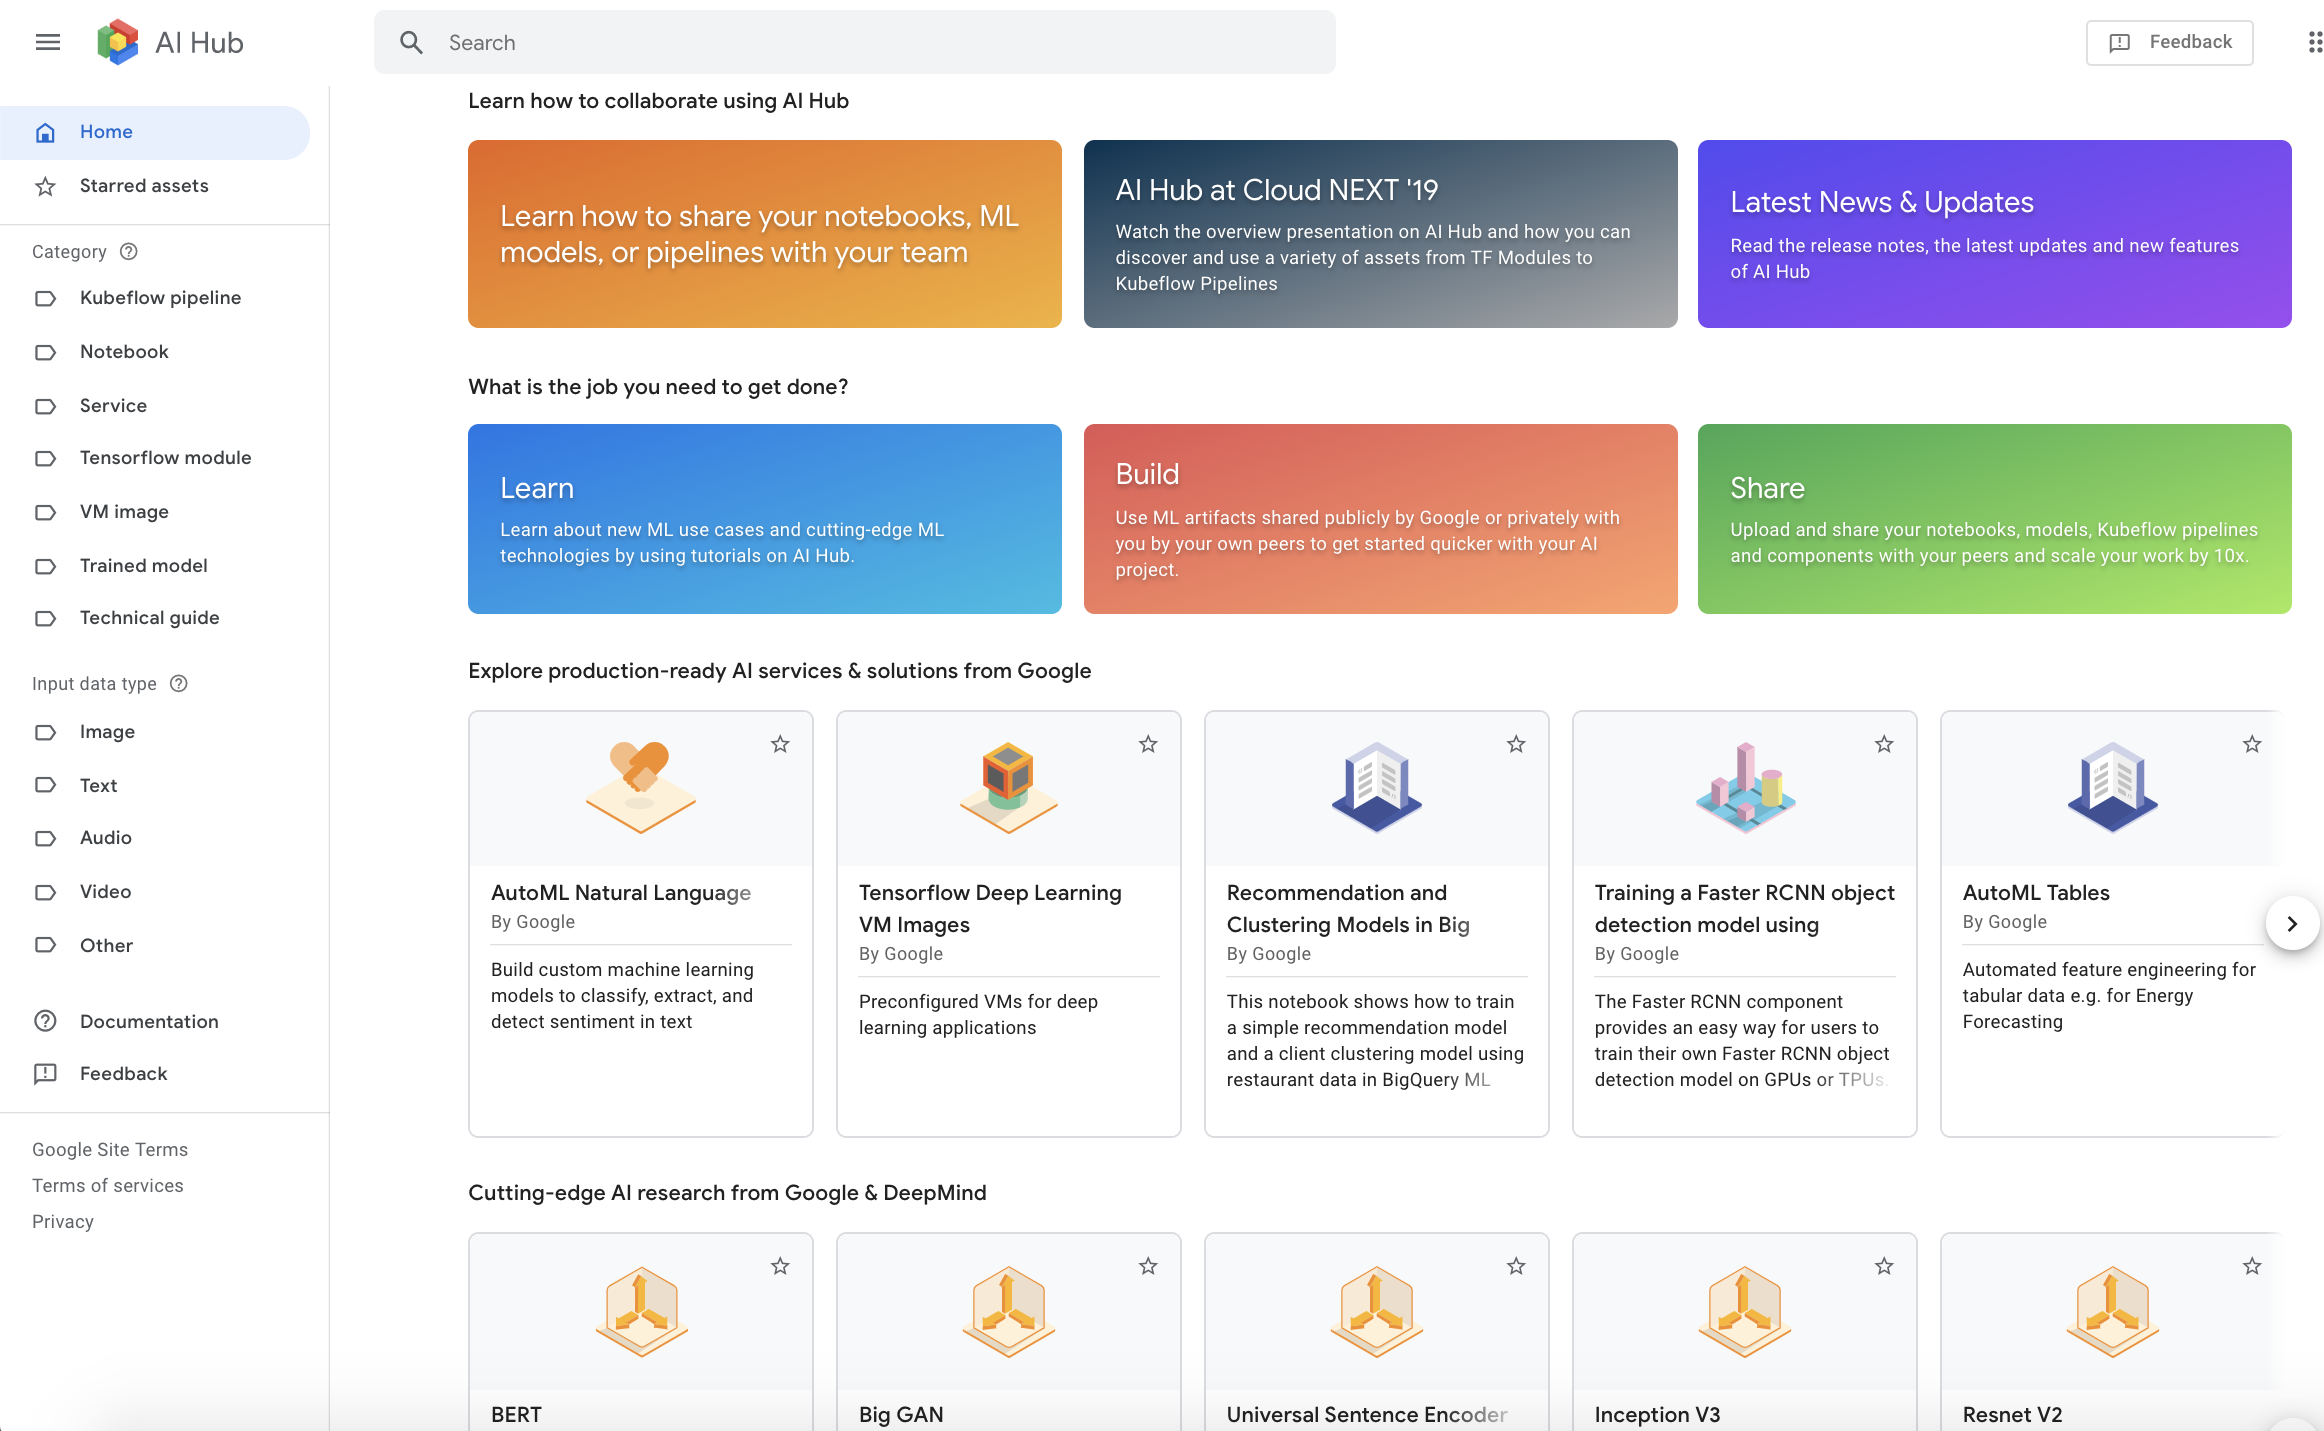 Google's AI Hub gets more sharing and collaboration tools